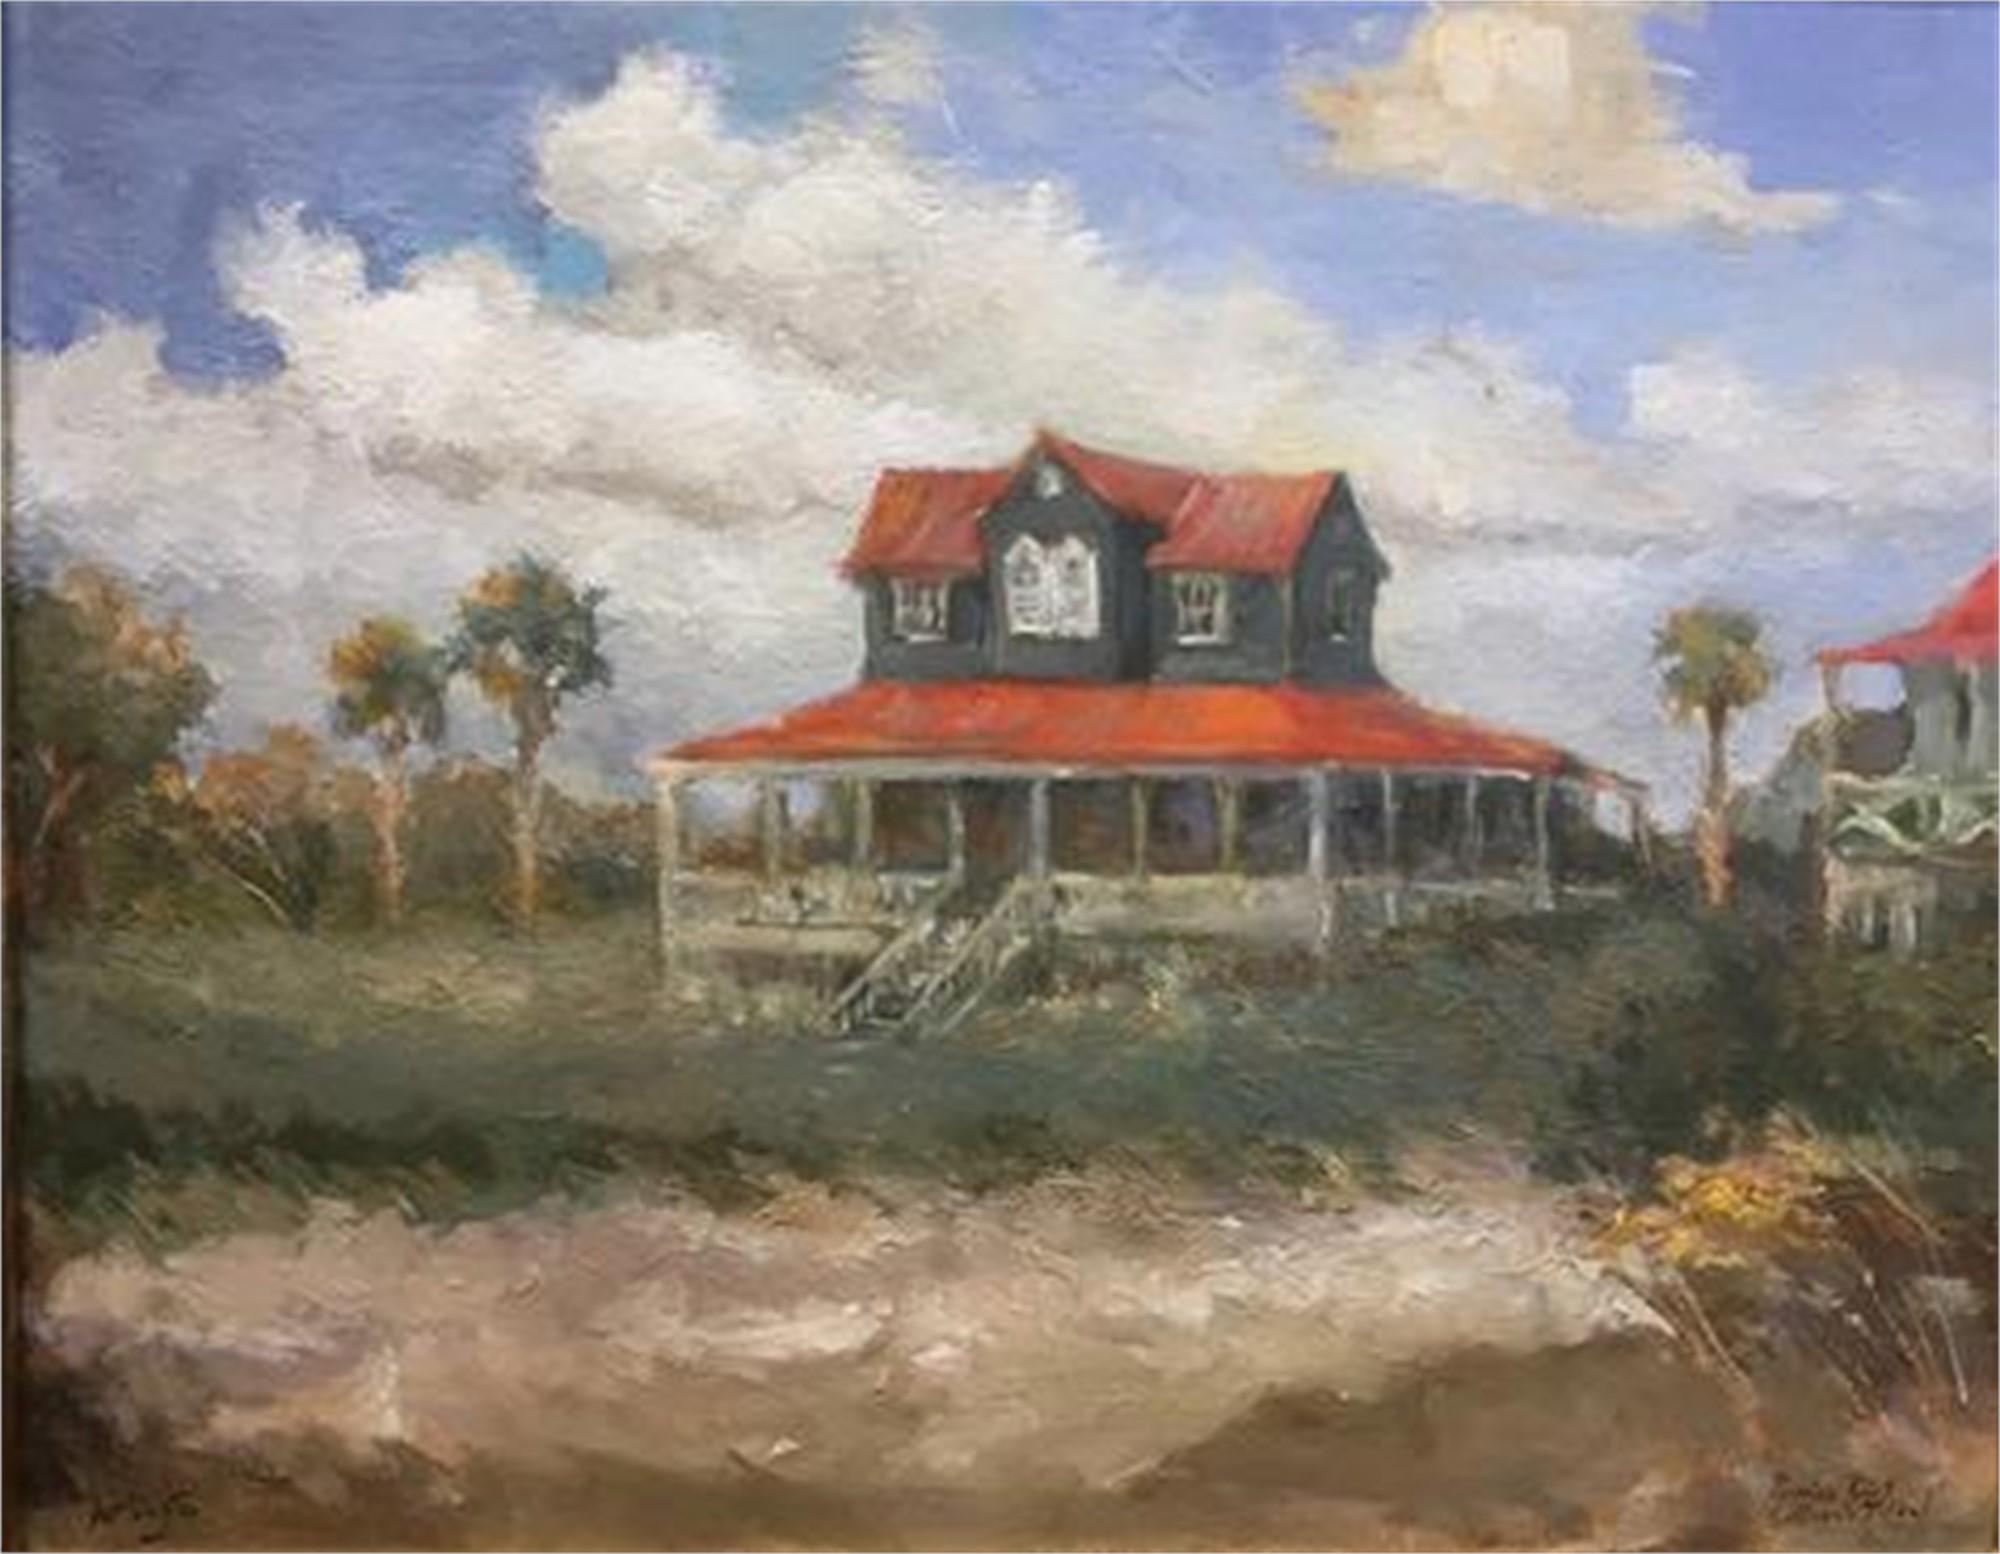 Porpoise Point Sullivan's Island by Jim Darlington